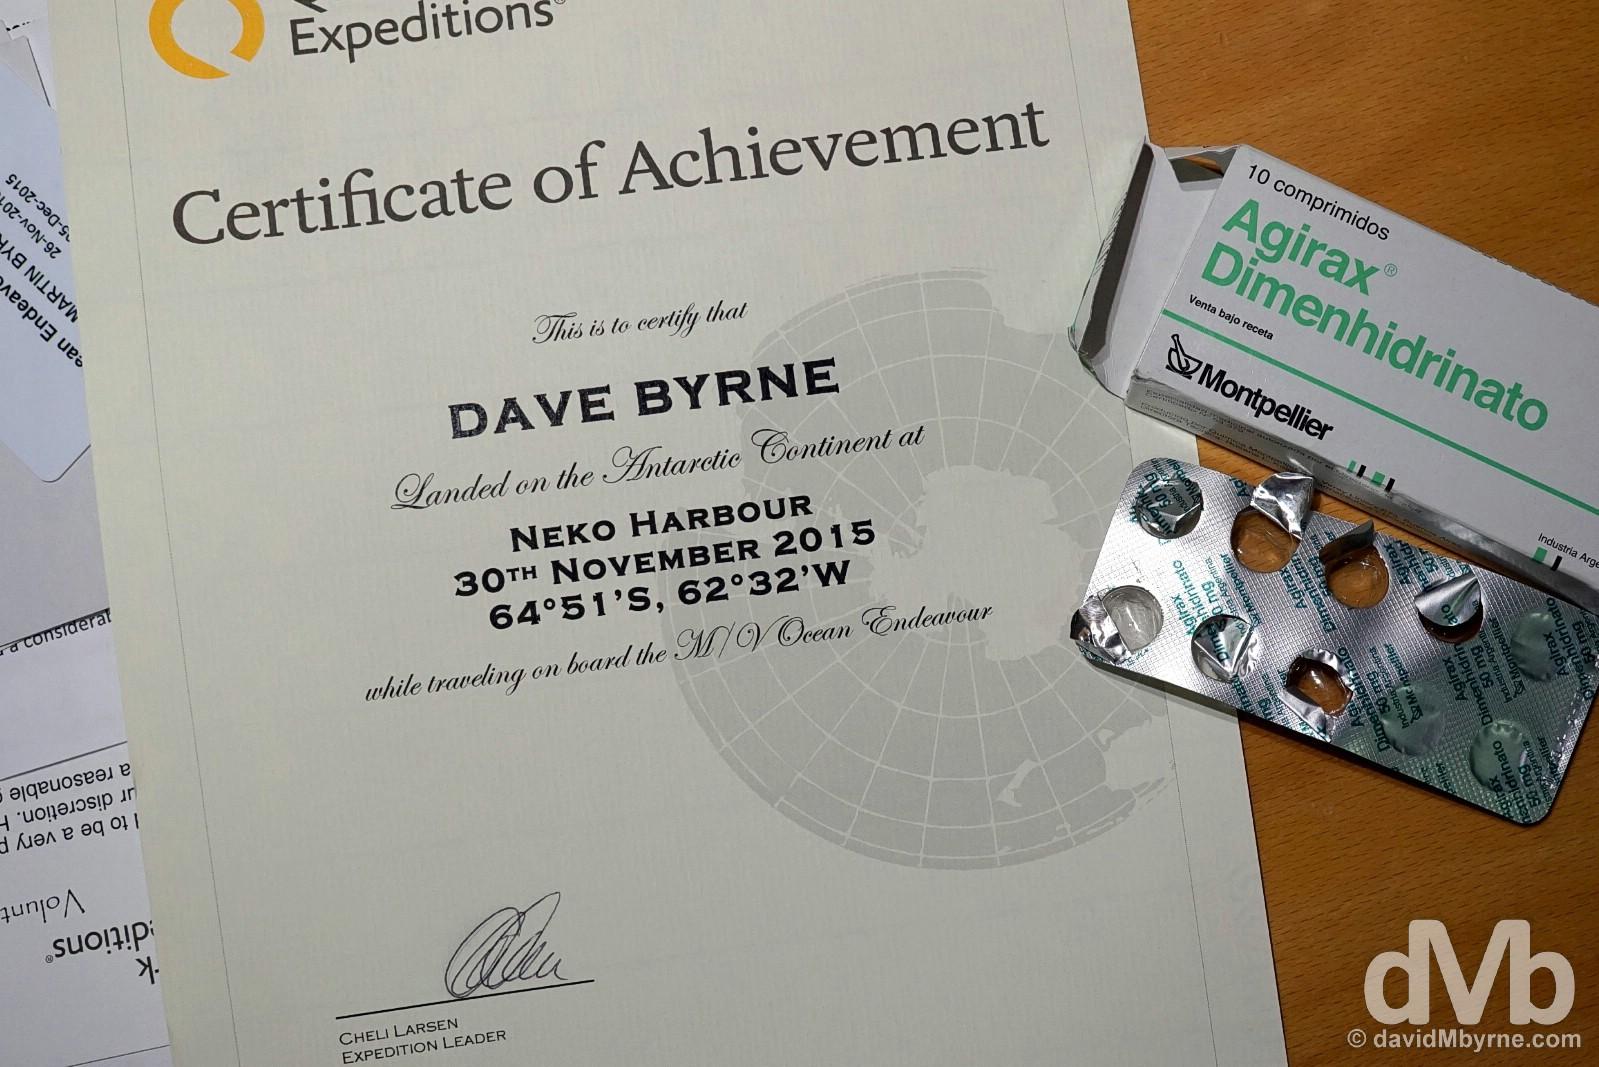 Antarctica Certificate of Achievement. December 4, 2015.